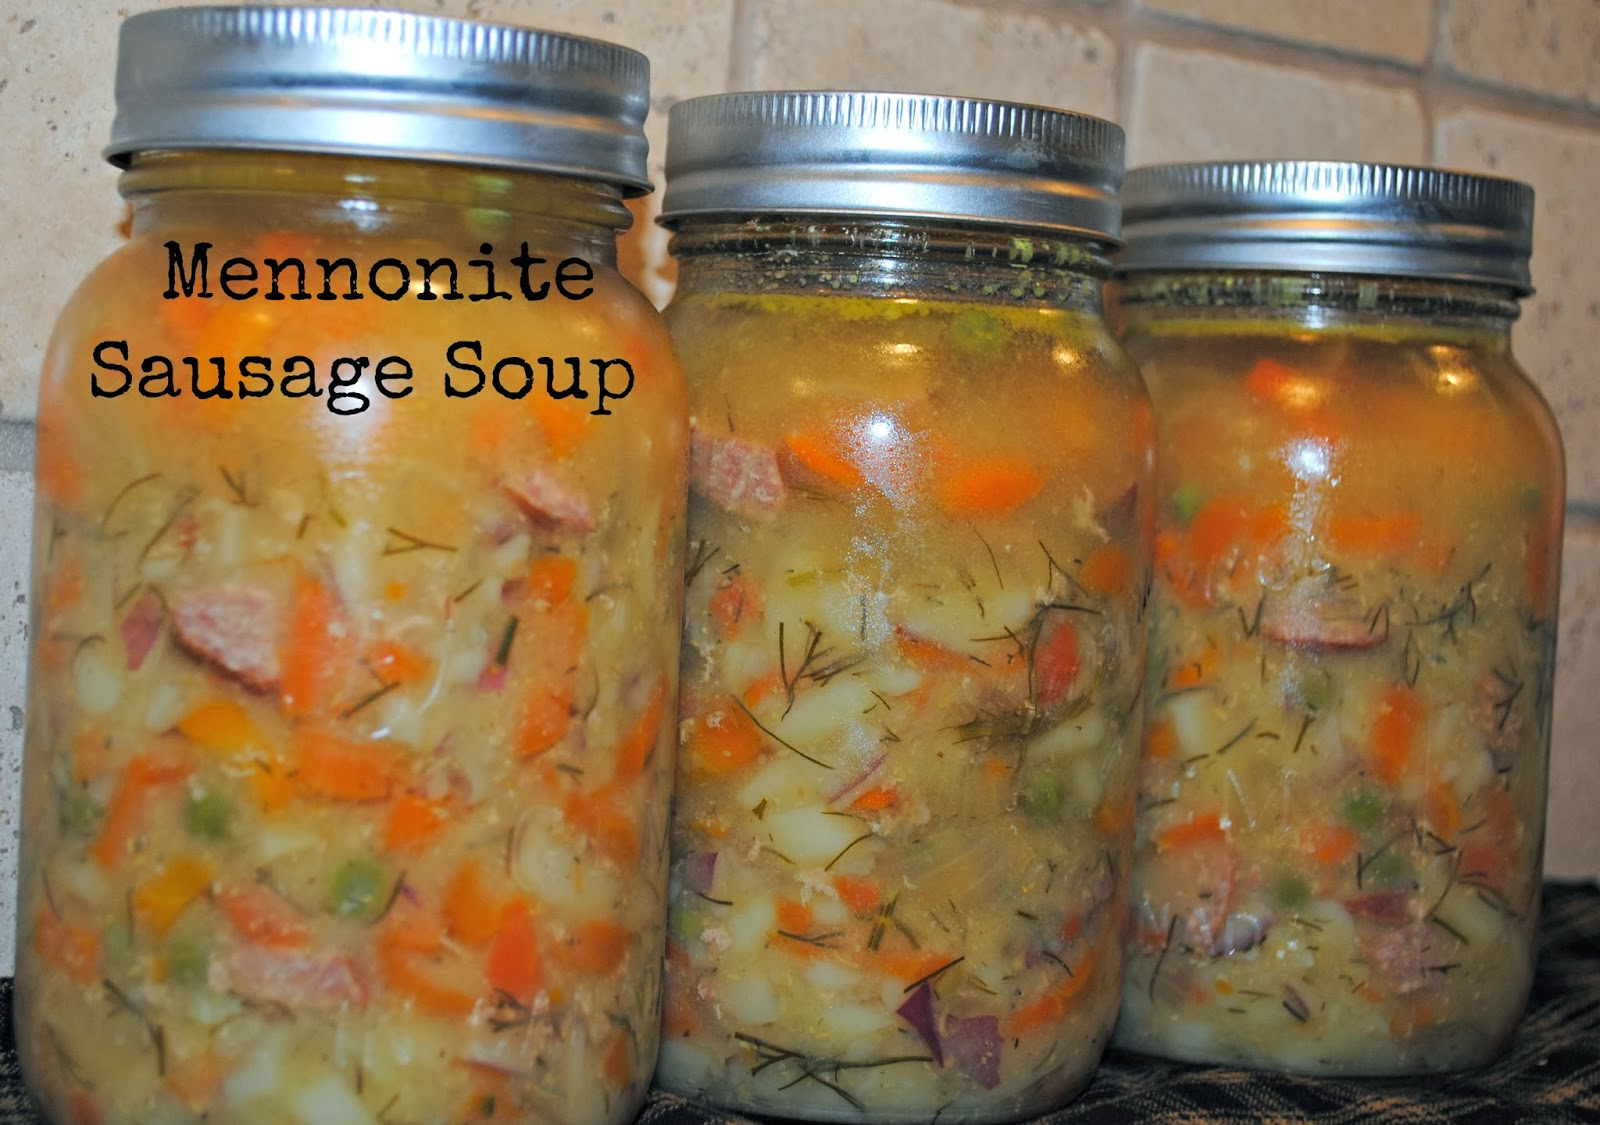 Little Prairie Baby: Mennonite Sausage Soup